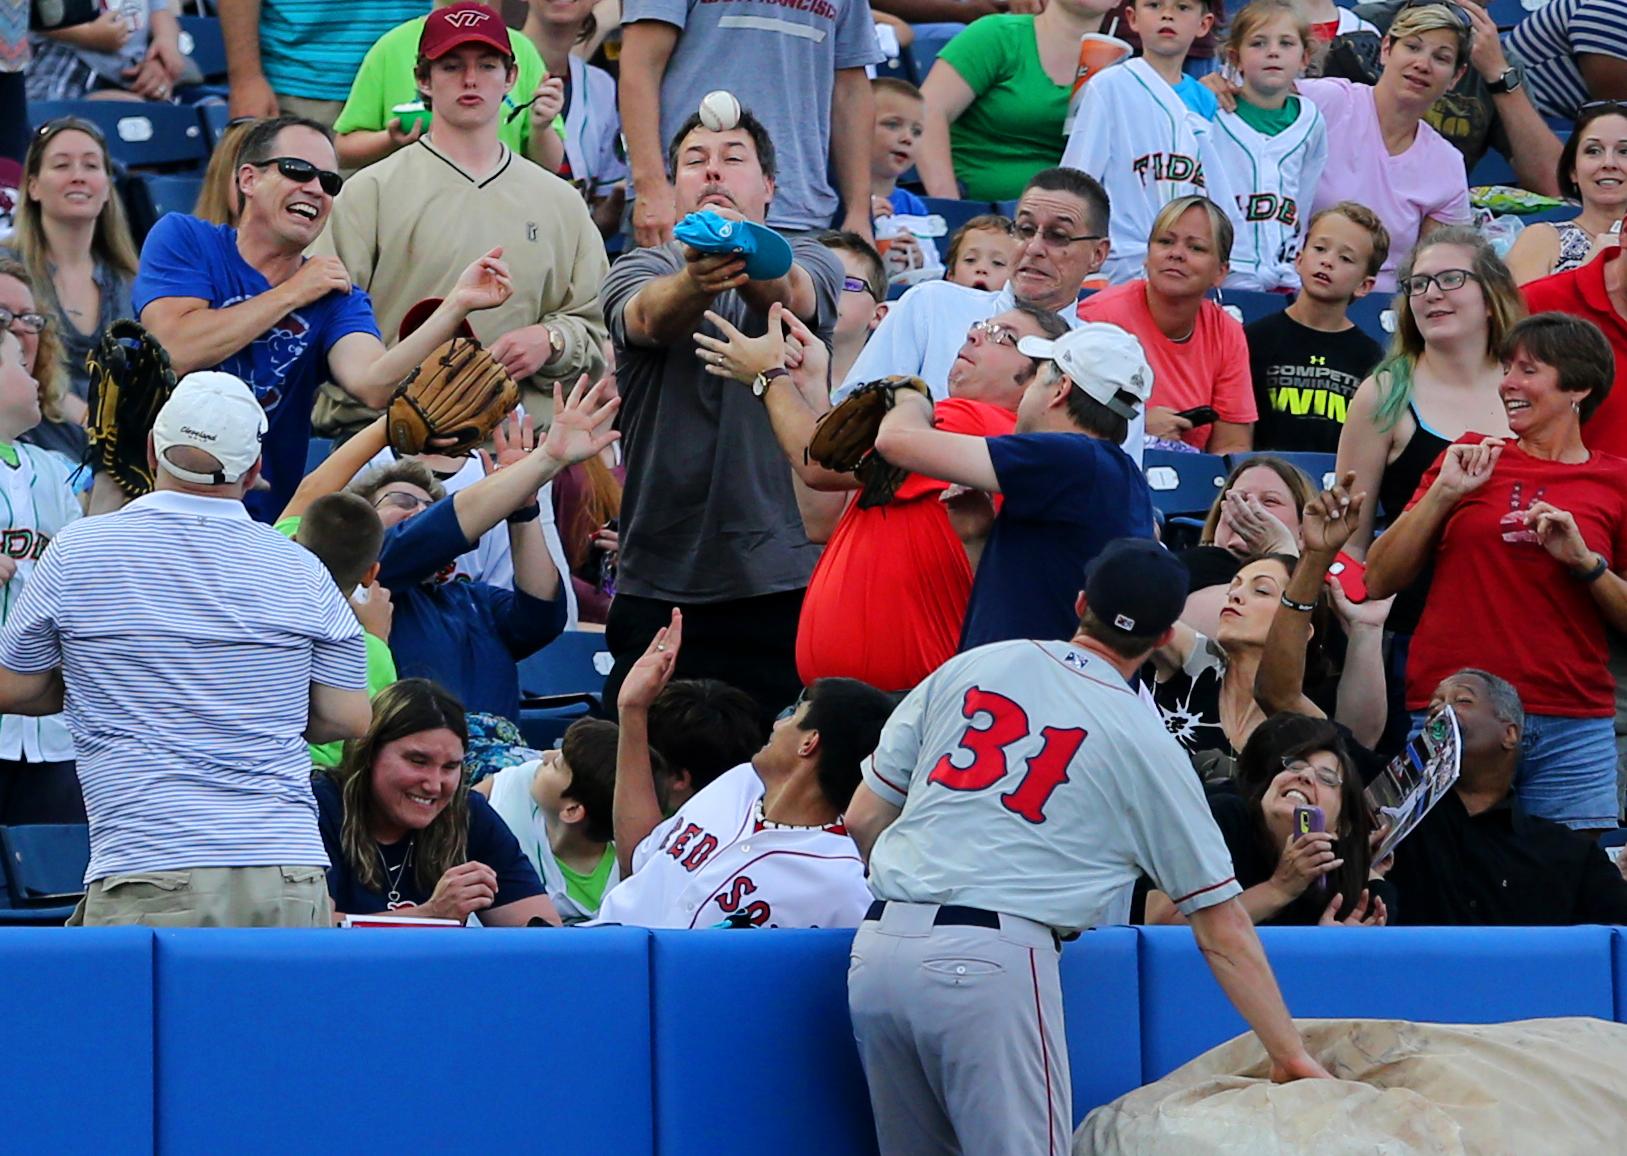 Pawtucket third baseman Jantzen Witte runs out of room on a foul ball off the bat of Norfolk's Christian Walker, Friday, June 3, 2016 at Harbor Park in Norfolk.